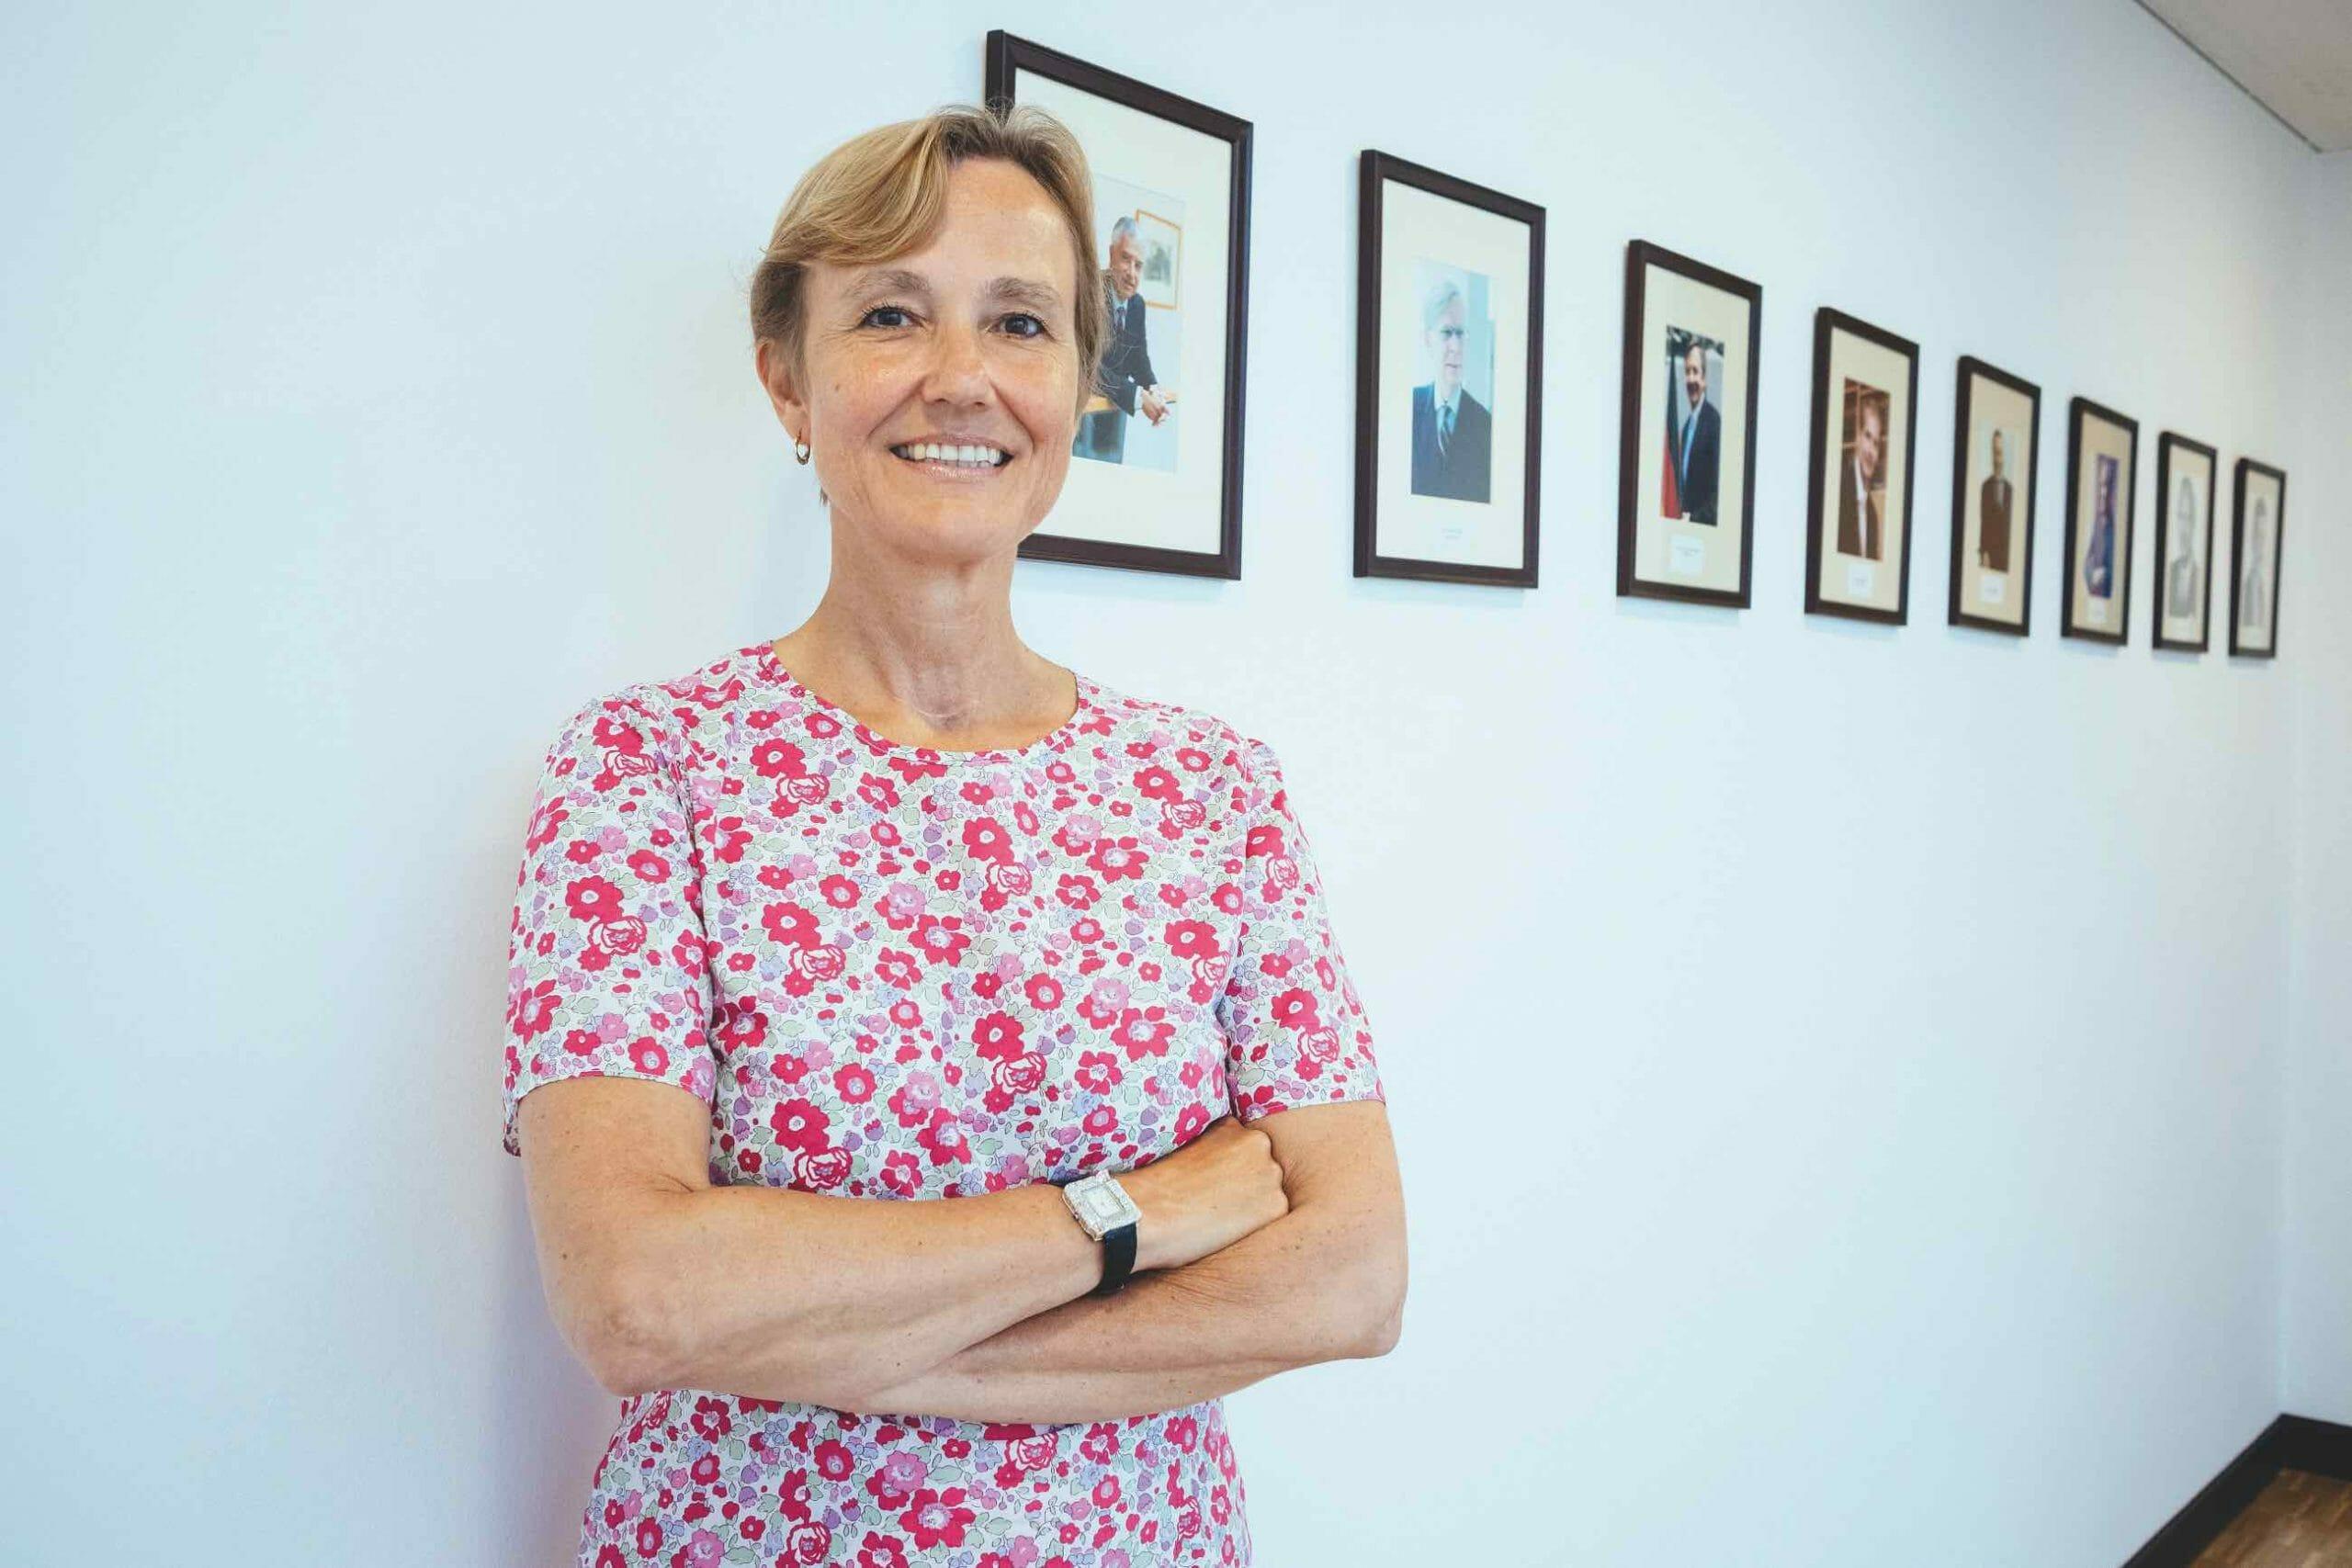 Anka Feldhusen: Ambassador ofGermany to Ukraine